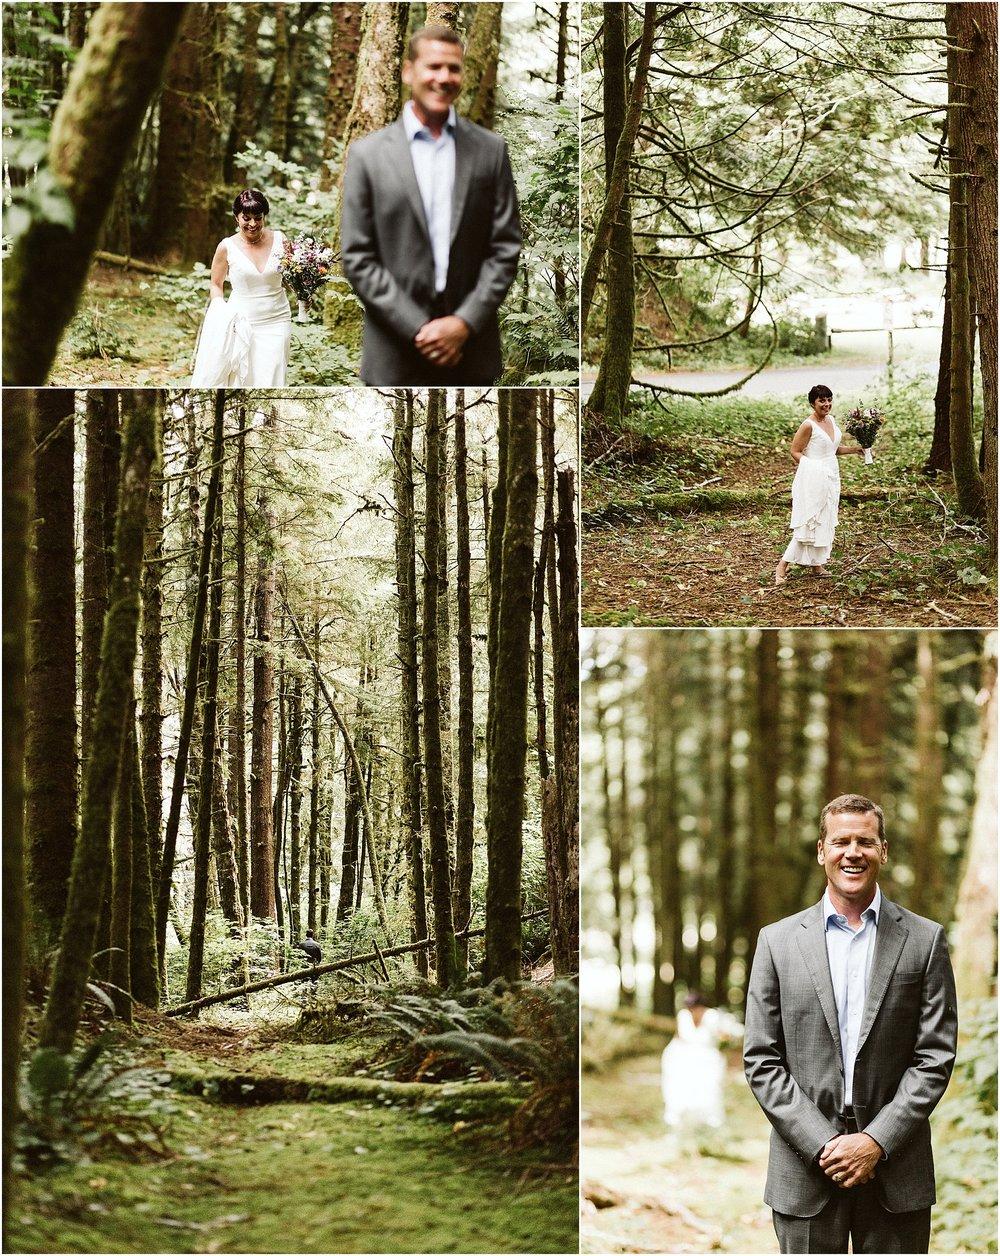 Oregon Coast Intimate Wedding | oregon elopement photographer | oregon elopement2.jpg